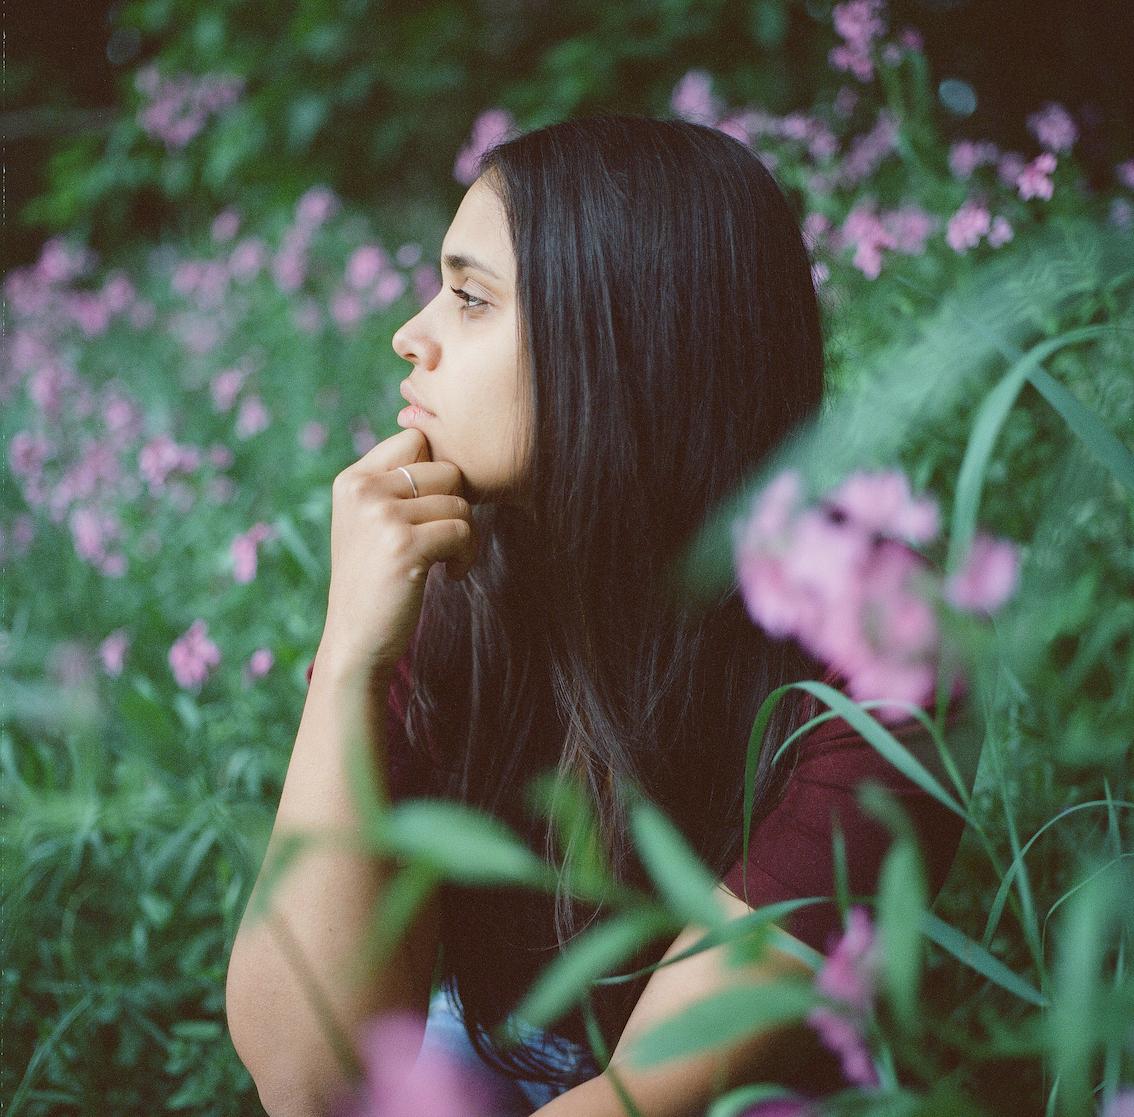 Lydia Persaud_Promo Photo_Flowers_Photo Photo Credit J.Mitchel Reed.jpg